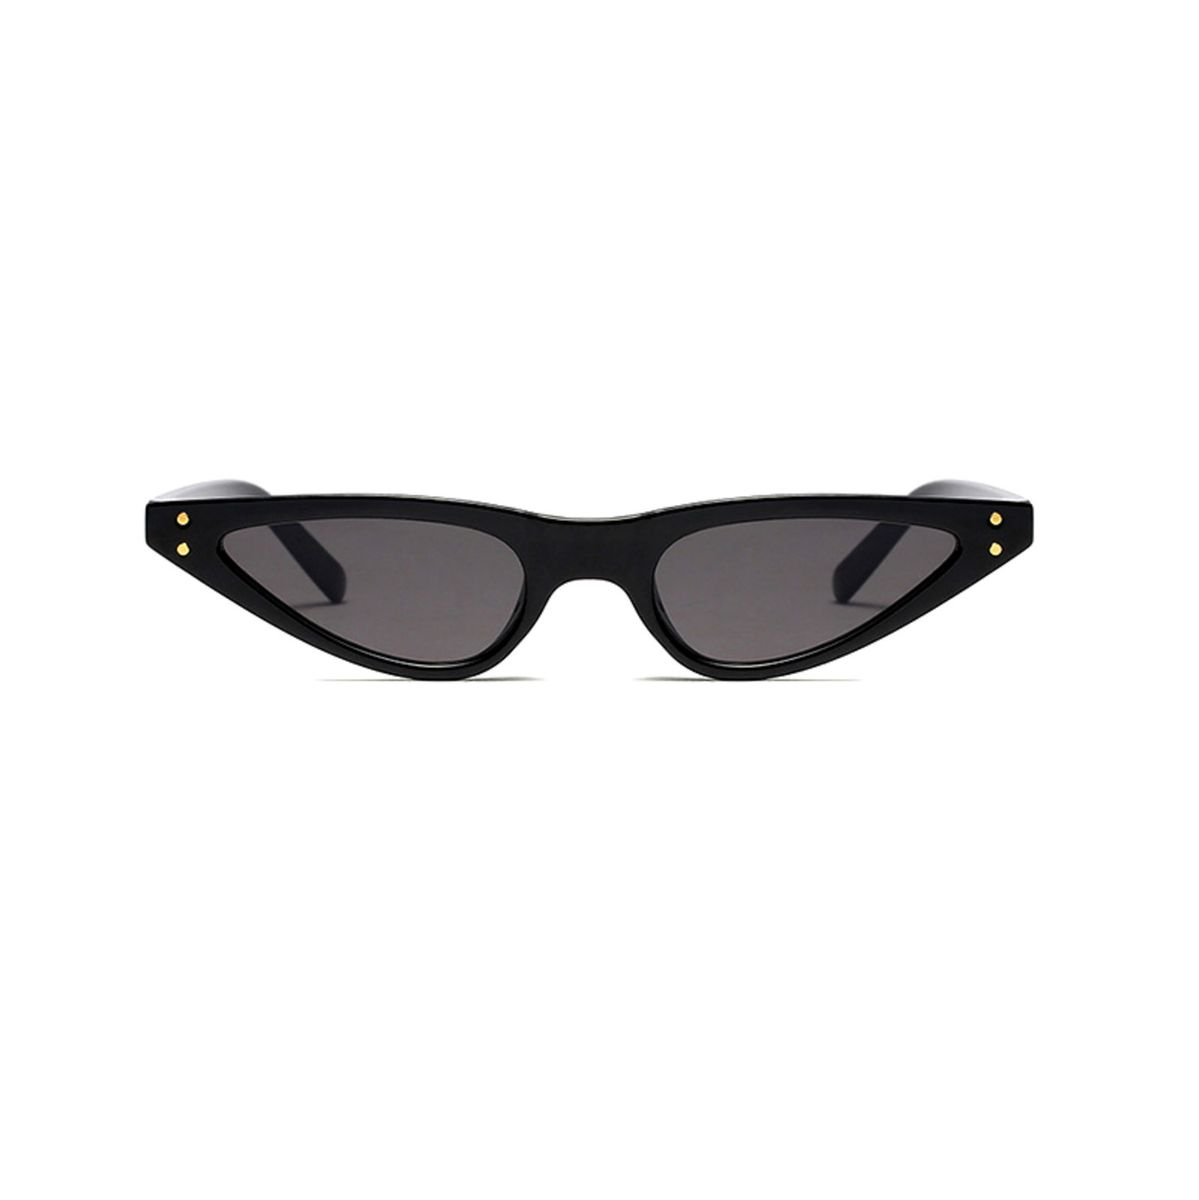 óculos gatinho skinny / vintage 90s micro triangular cat eye - óculos sem marca